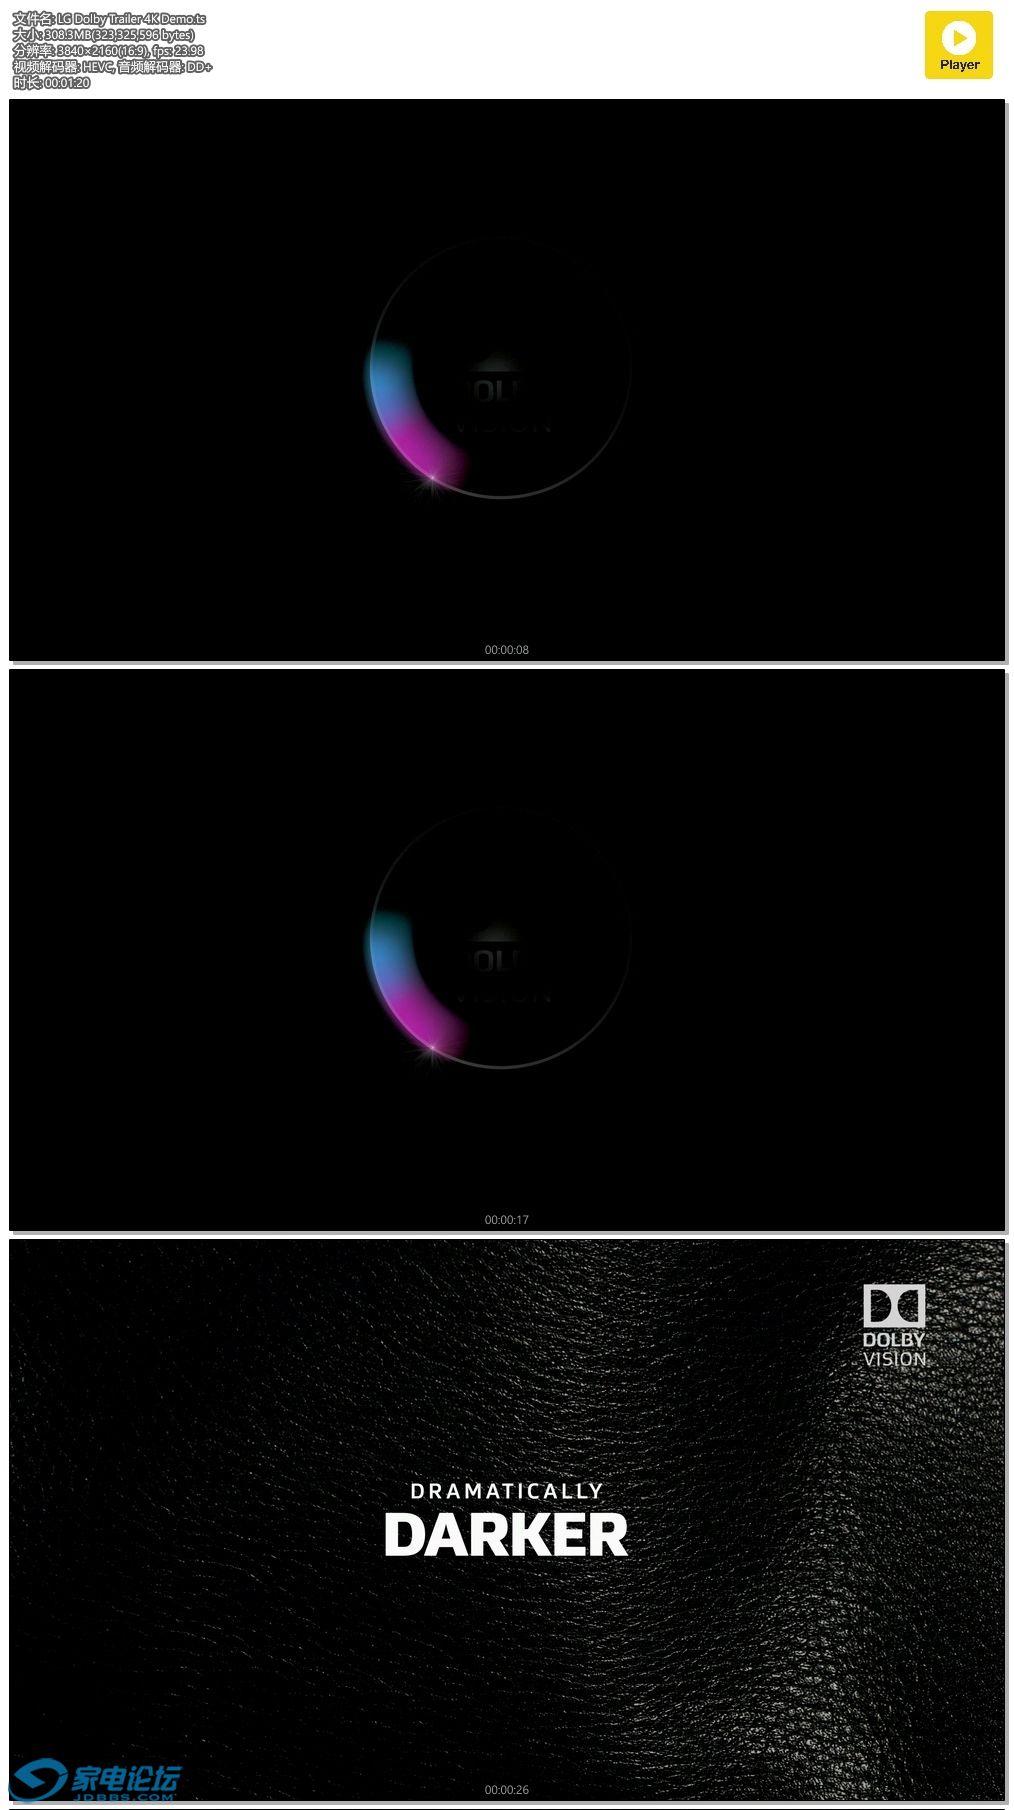 LG Dolby Trailer 4K Demo.ts.jpg